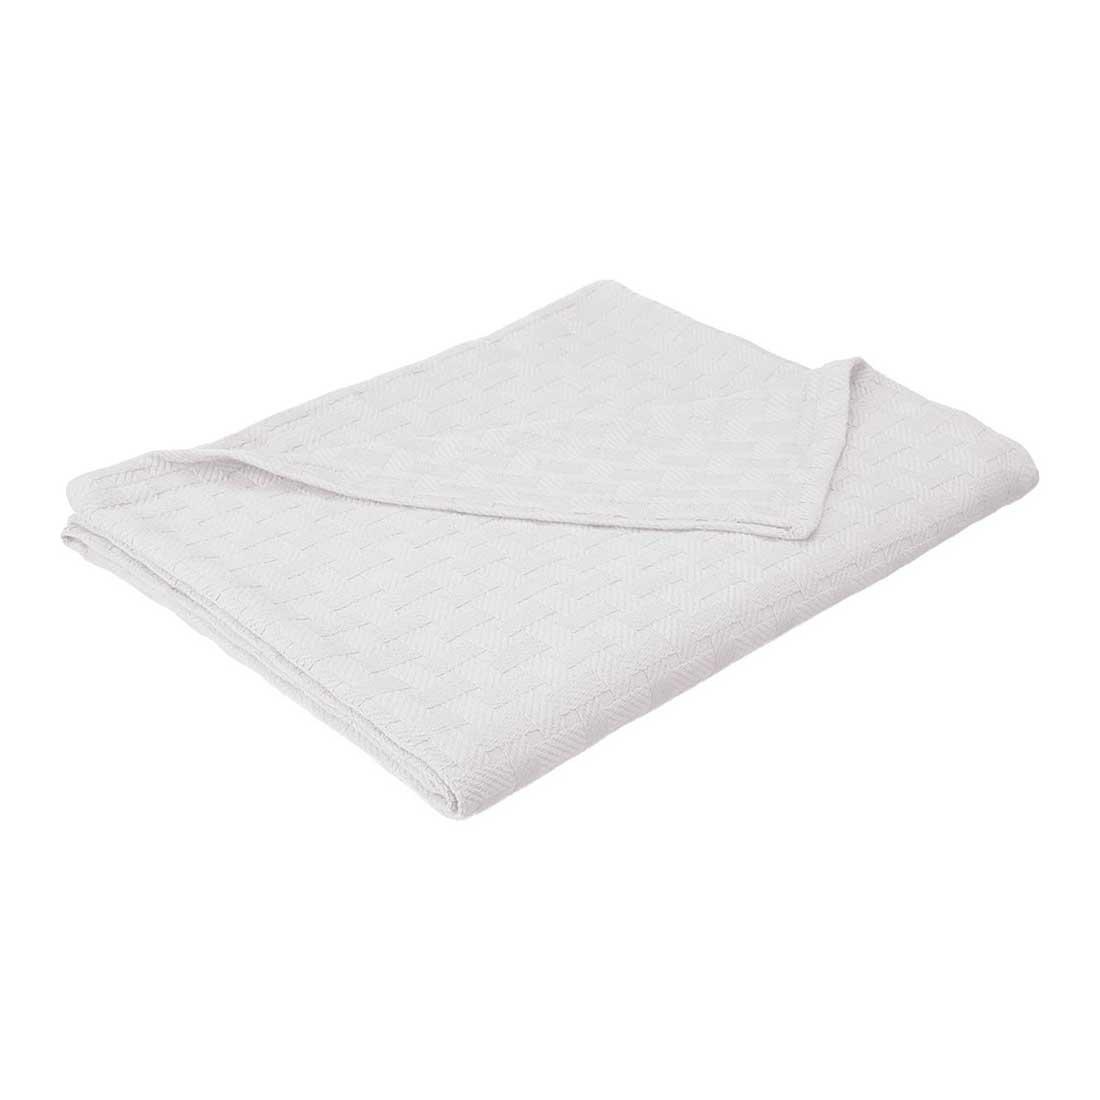 eLuxurySupply Basket Weave Blanket - 100% Soft Premium Cotton Blanket - Perfect for Layering Any Bed, King, White